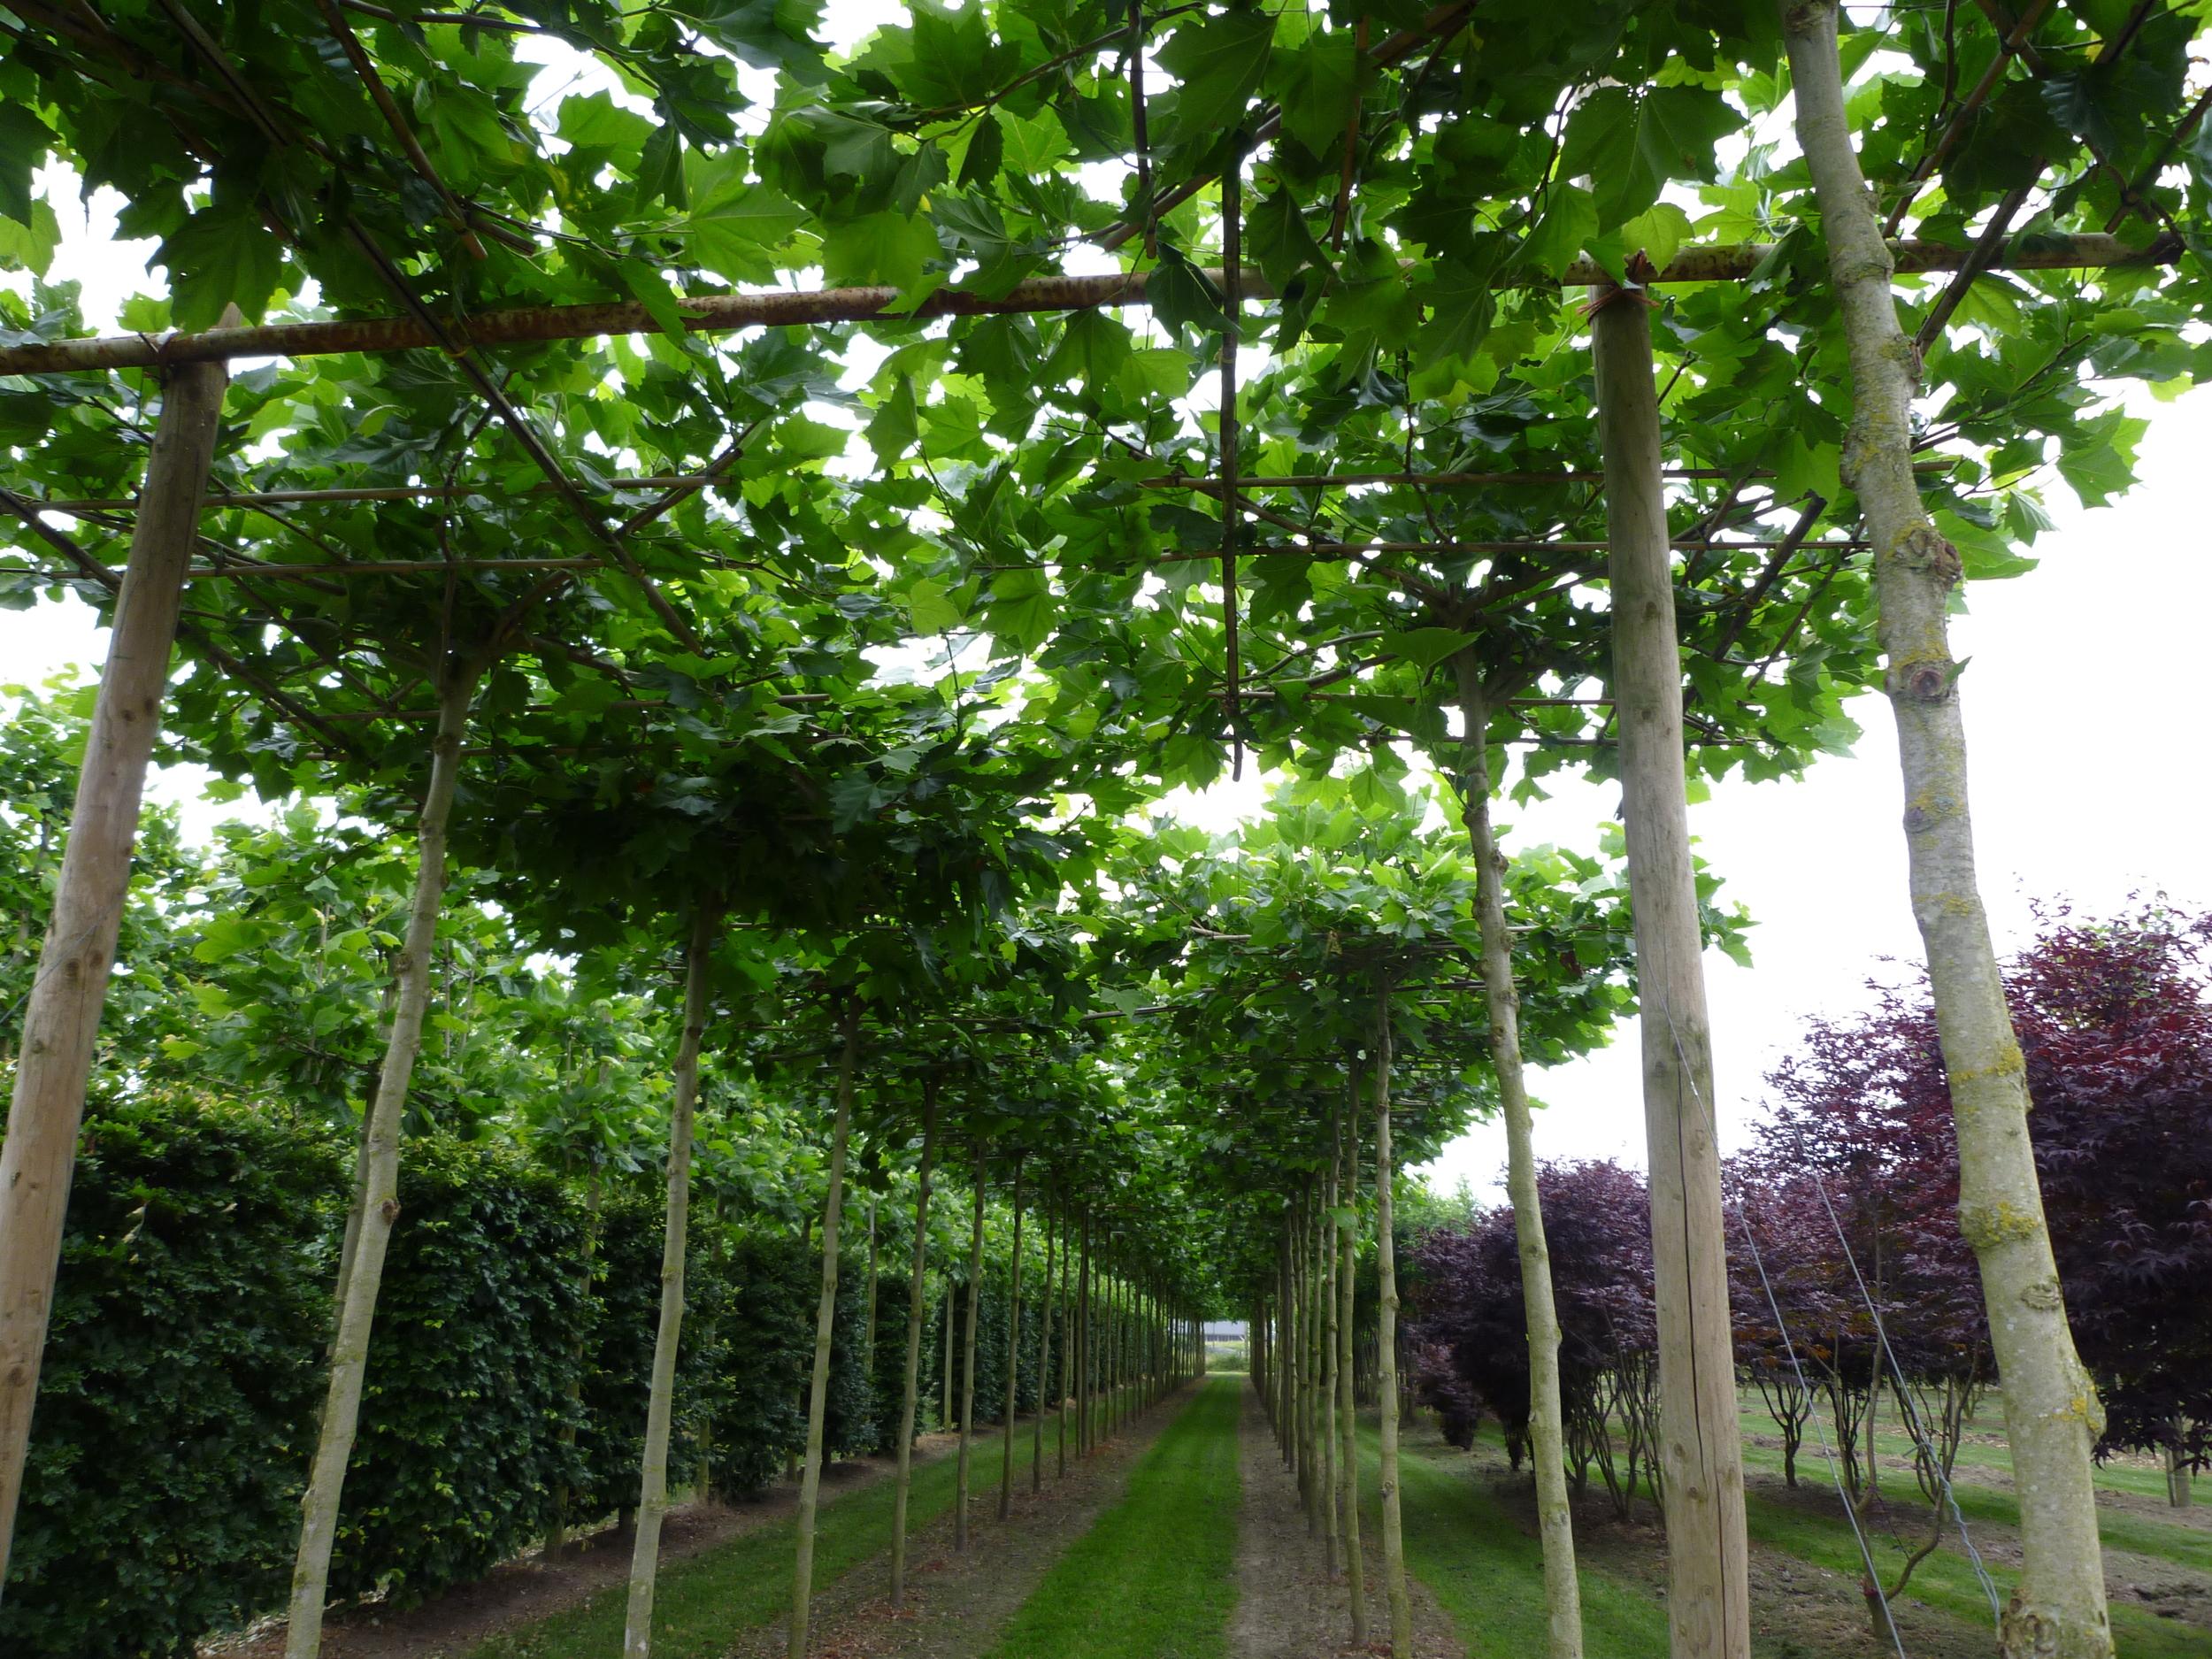 Lime parasol trees